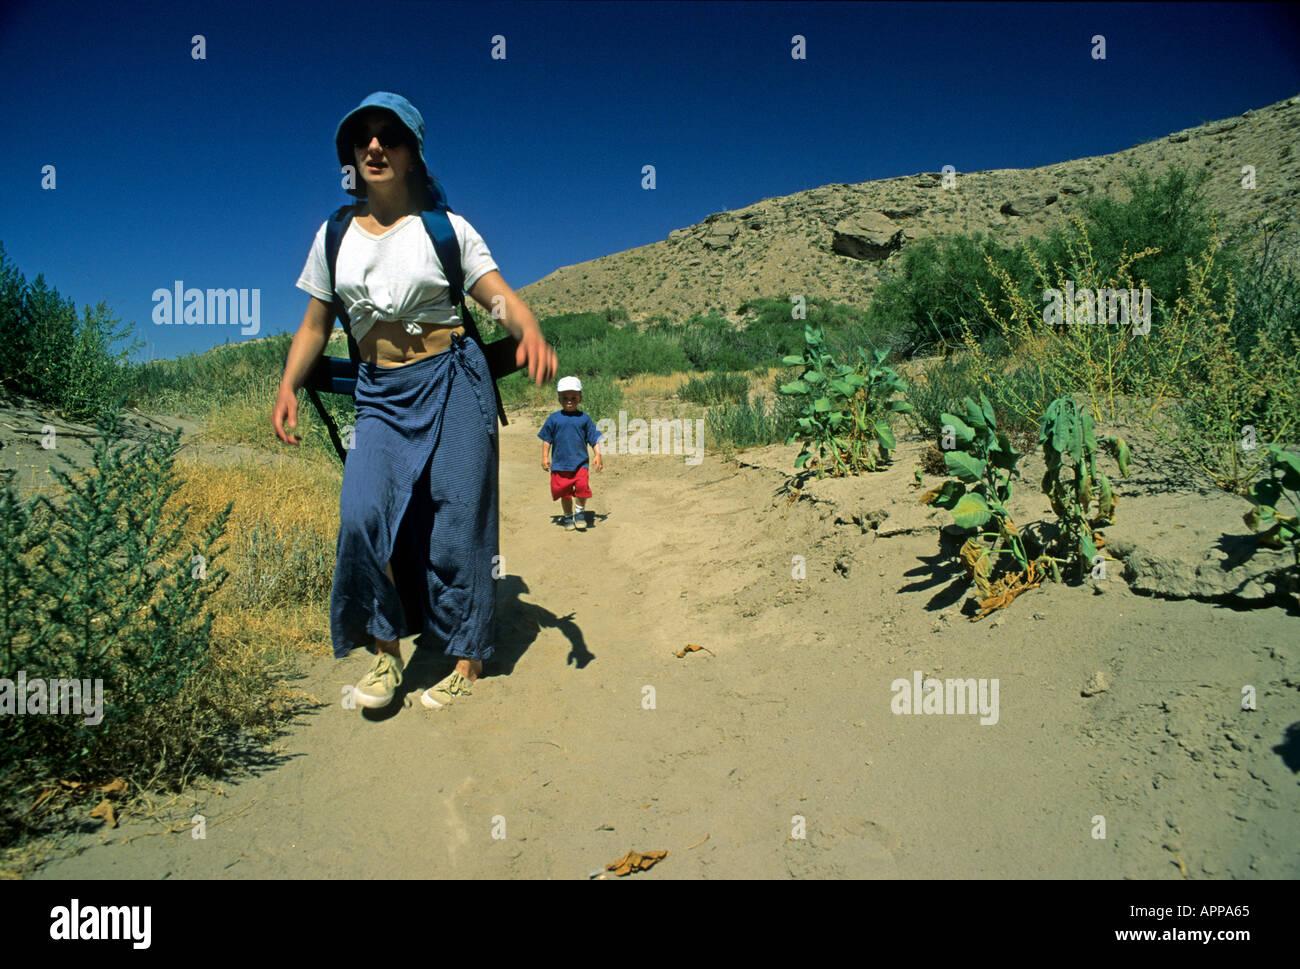 USA United States of America Texas Big Bend tourists walking near Boquillas Canyon - Stock Image